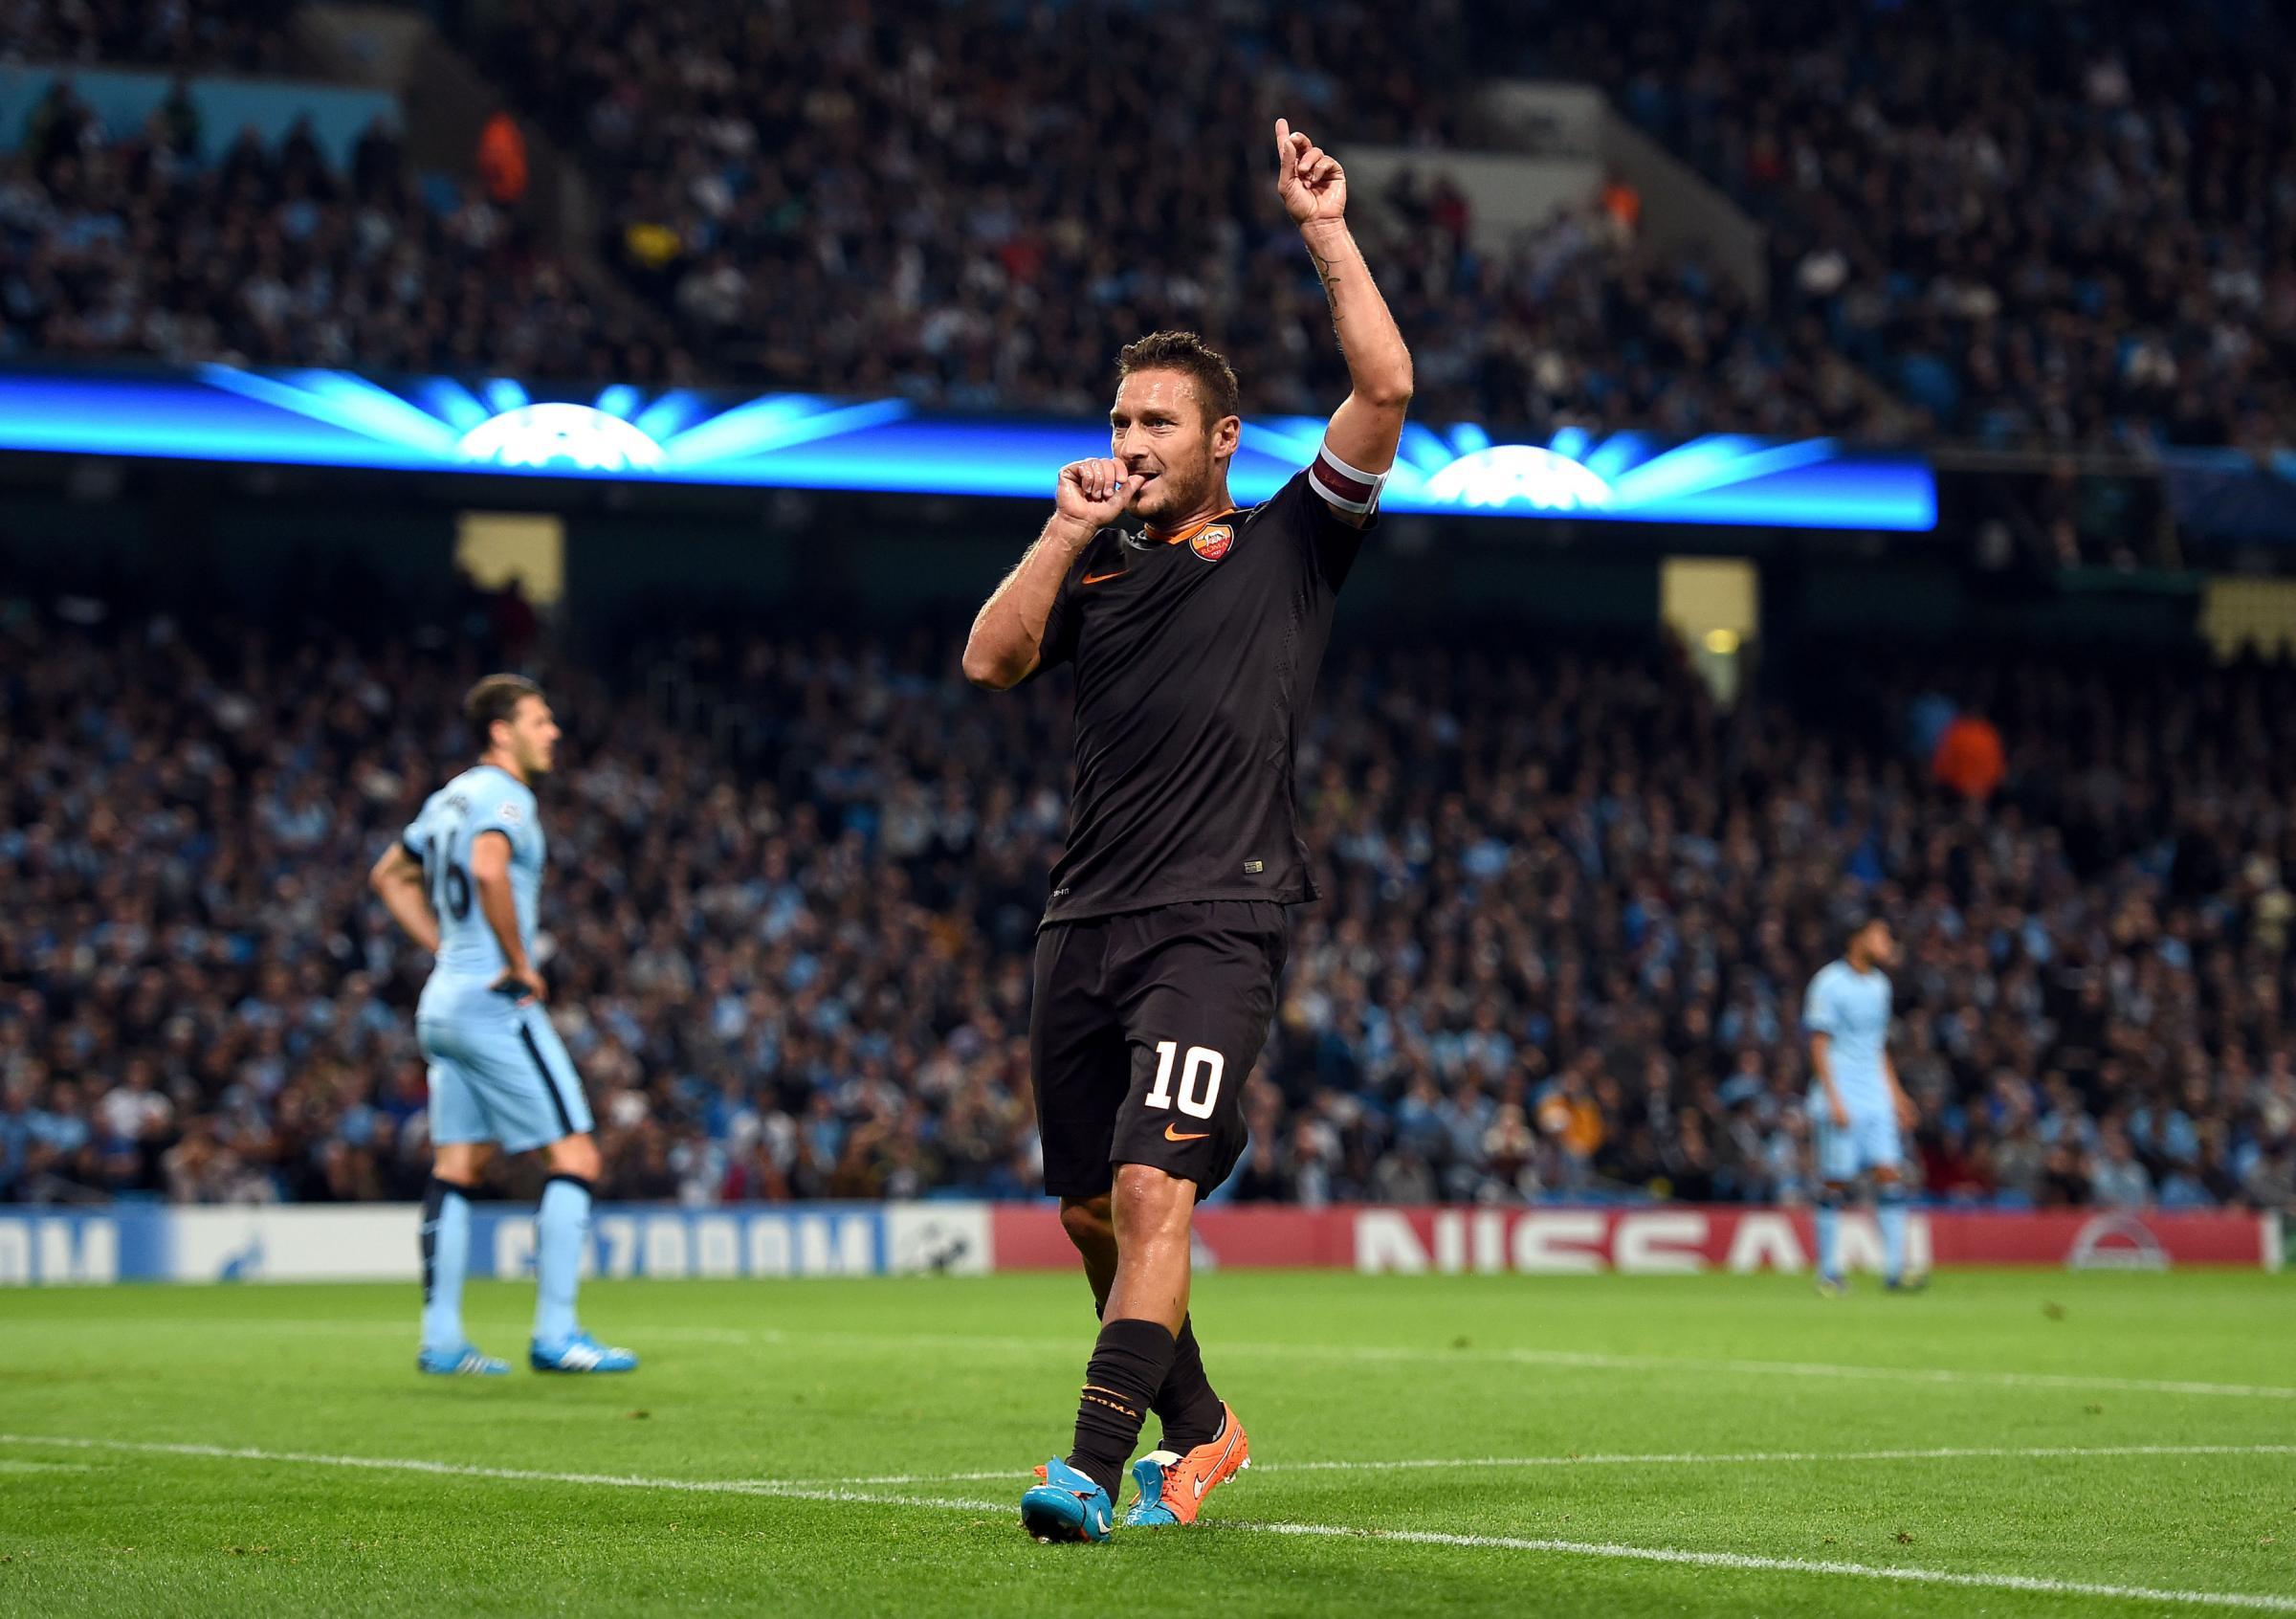 Totti goal